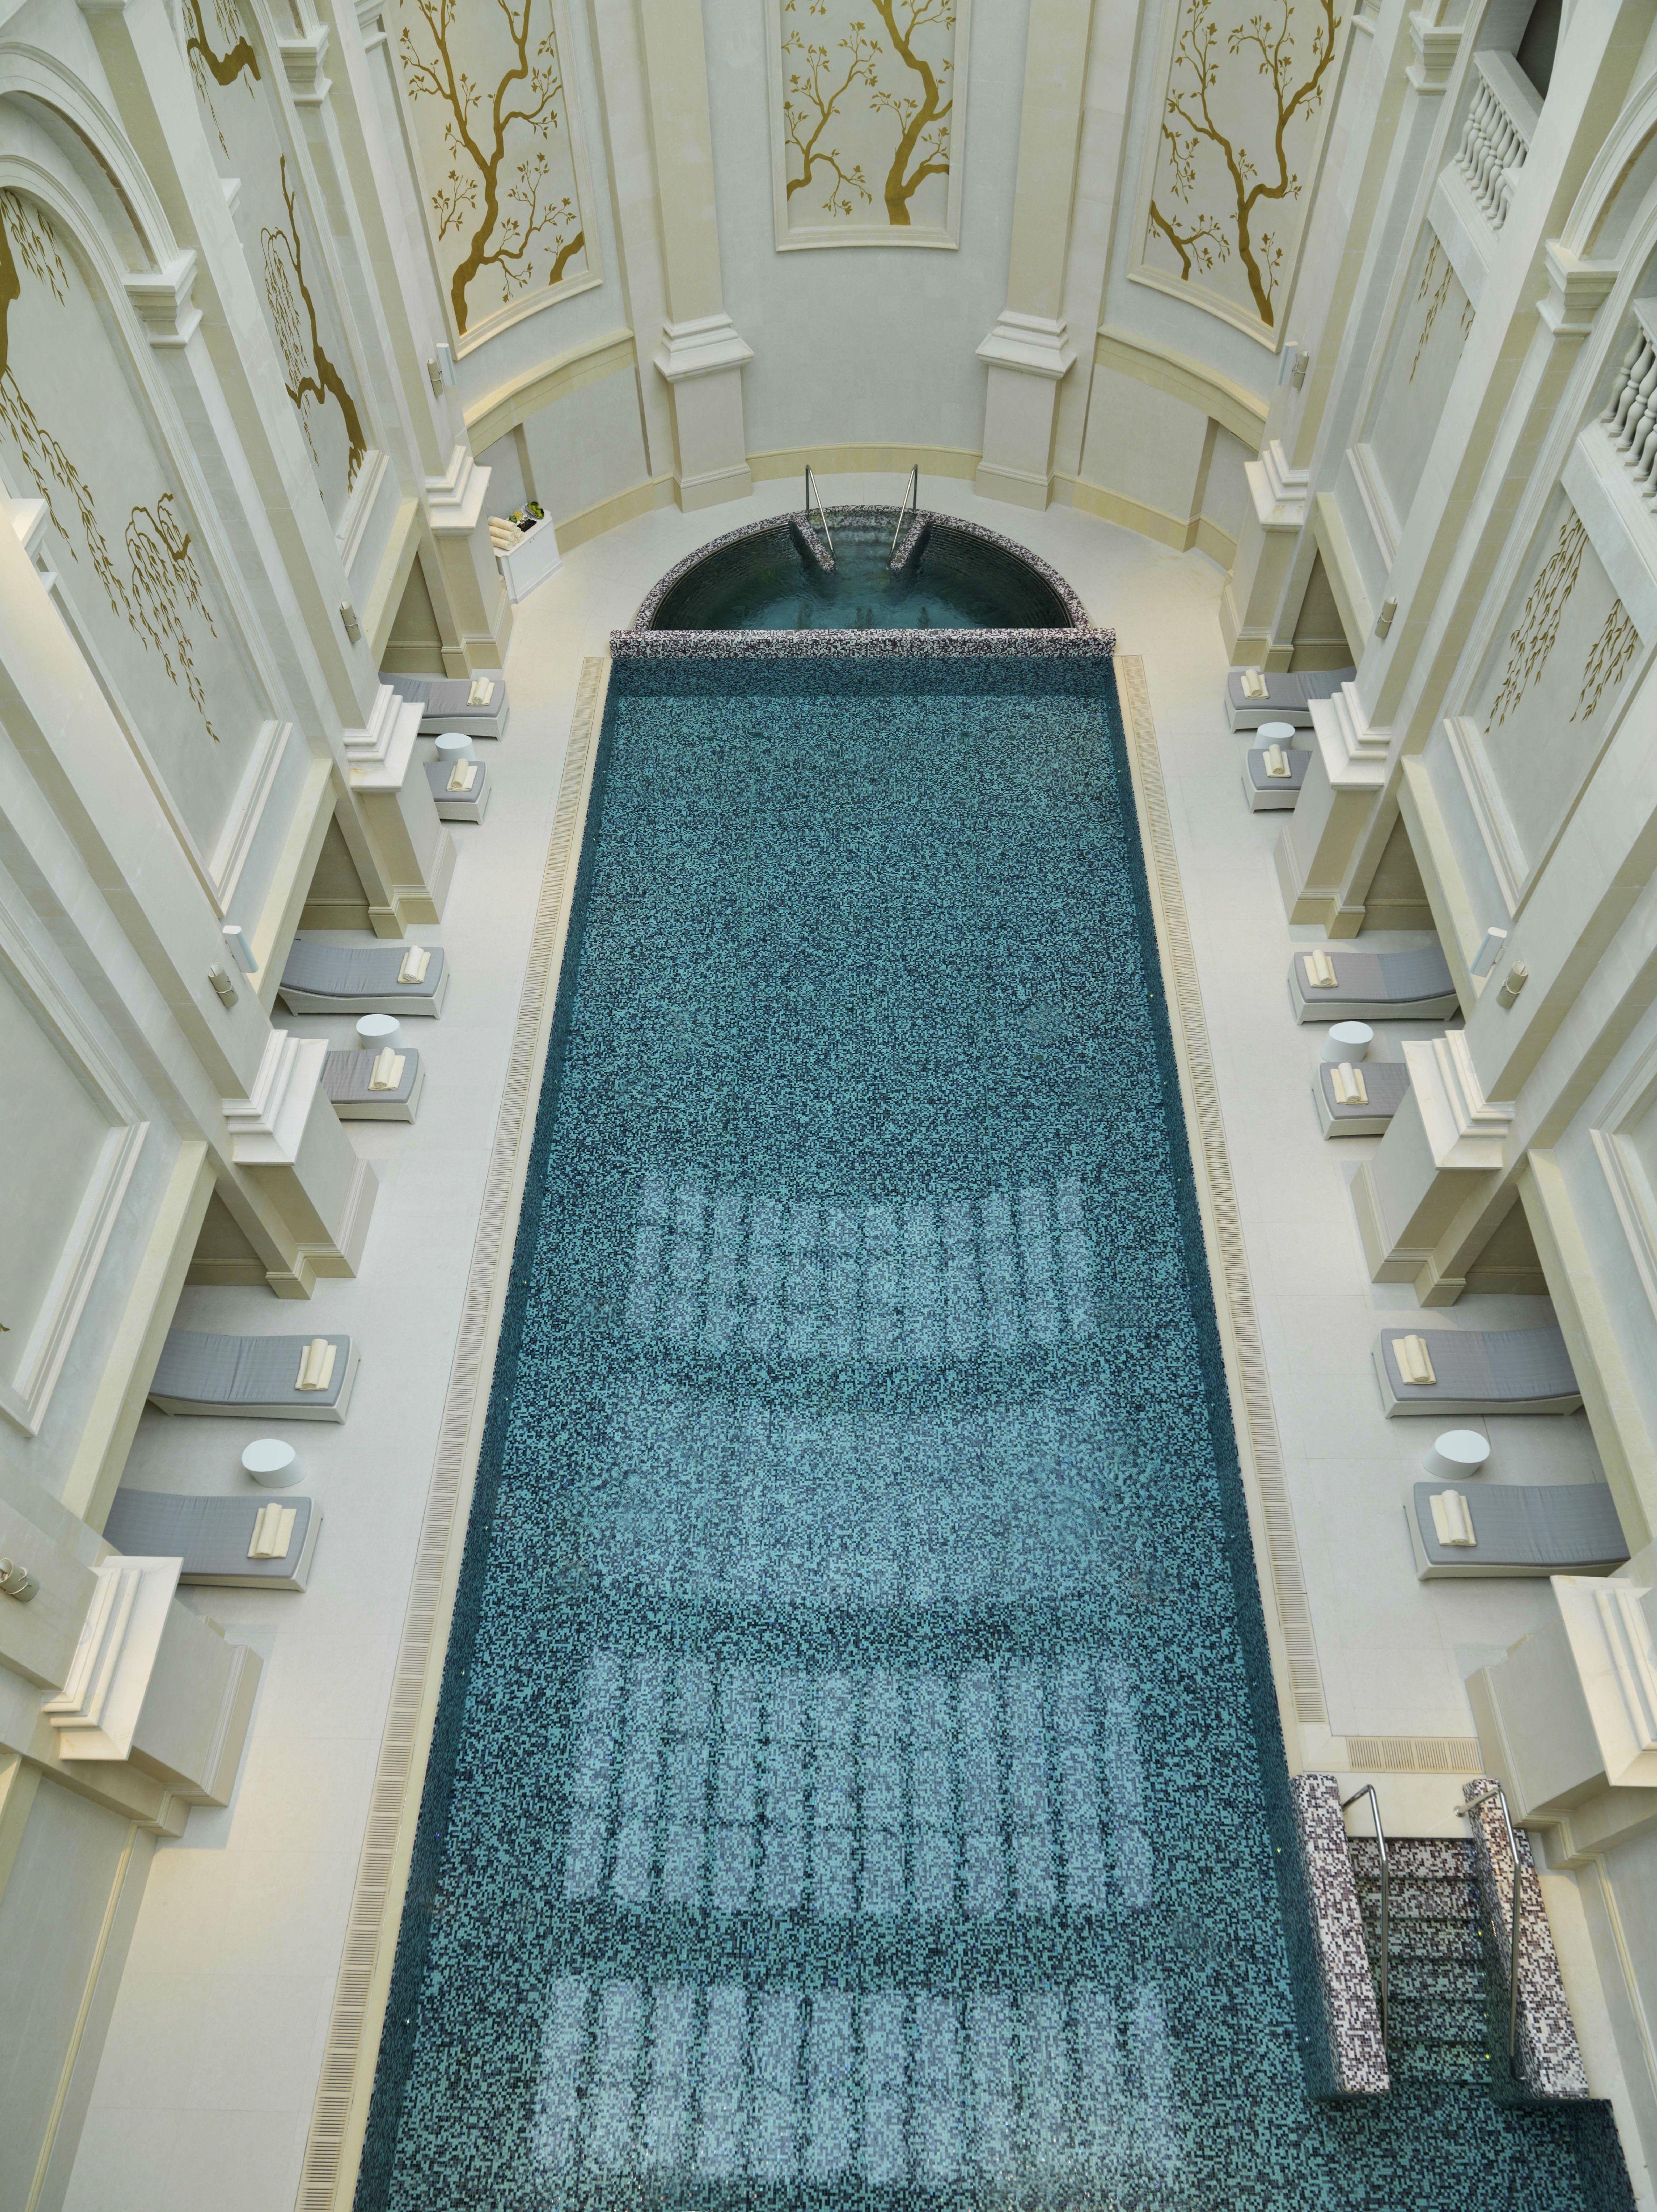 Four Seasons Hotel Baku Picture Gallery Dream Pool Indoor Luxury Pools Four Seasons Hotel